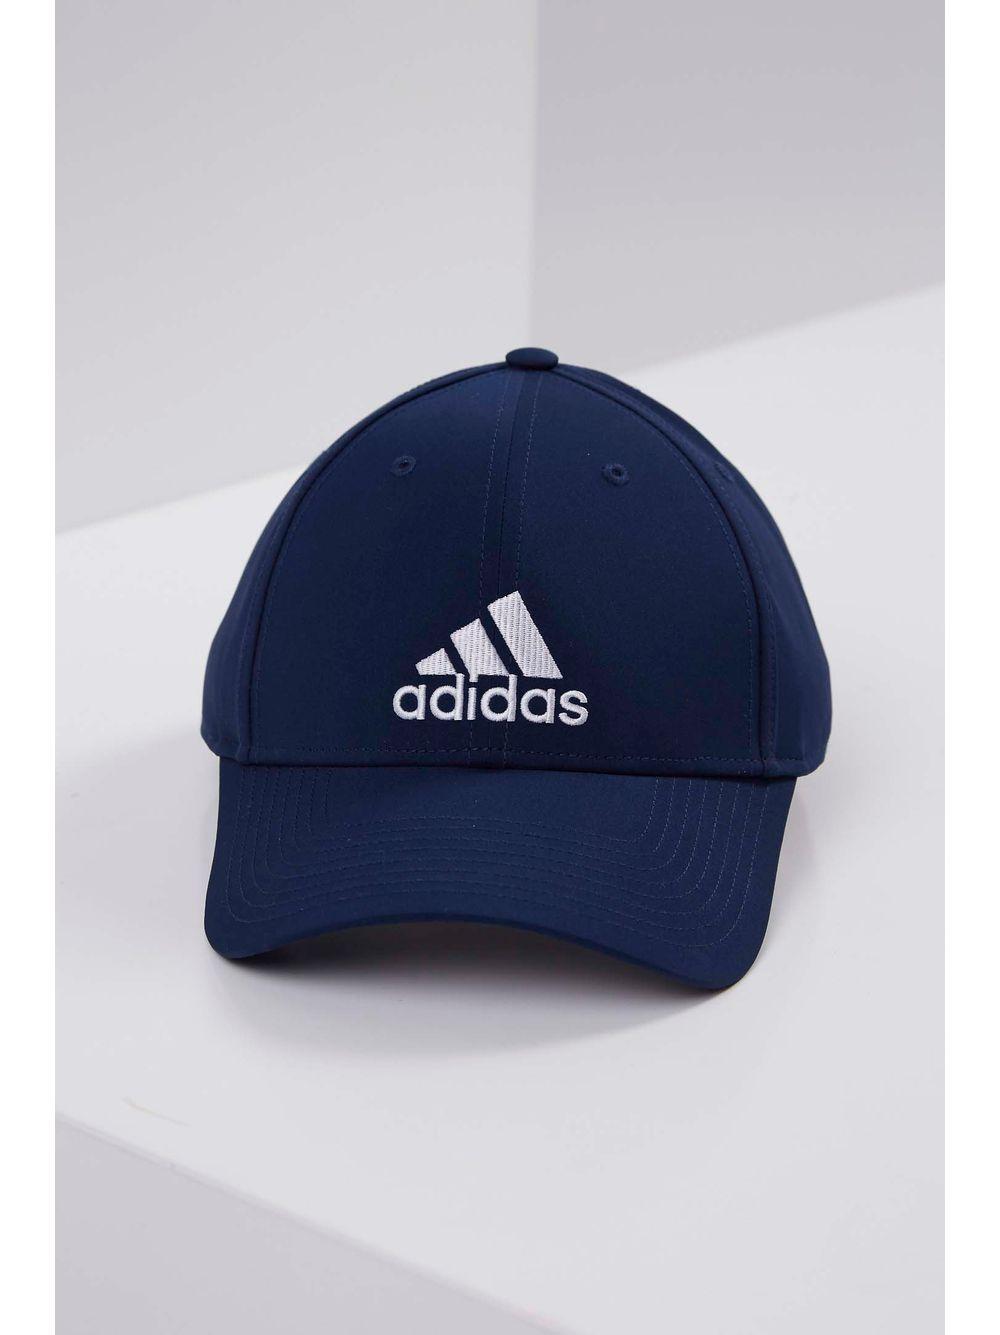 ee54c8f039 Boné Bordado Adidas. Marinho - pittol